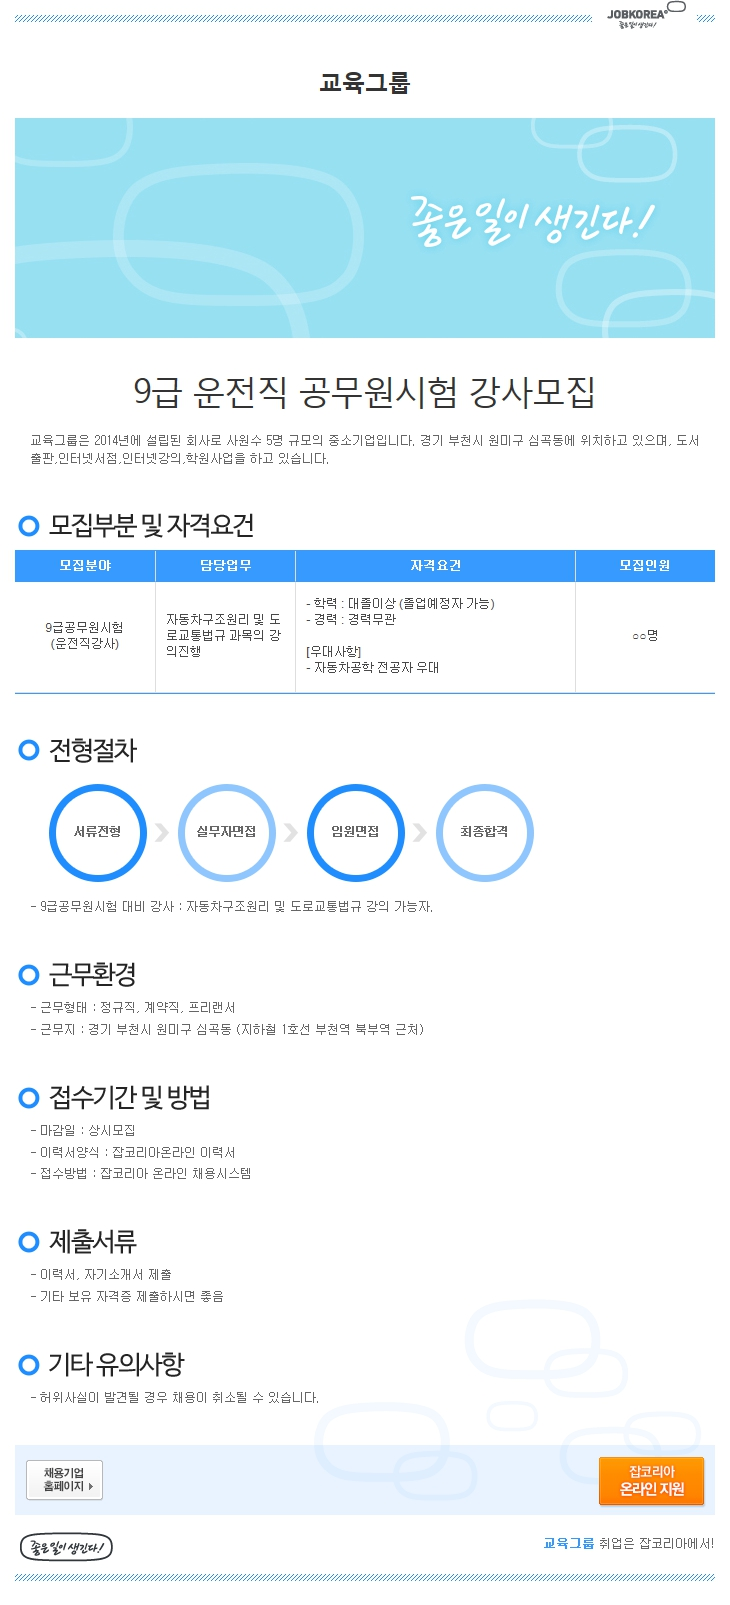 jobkorea_co_kr_20151209_131716.jpg